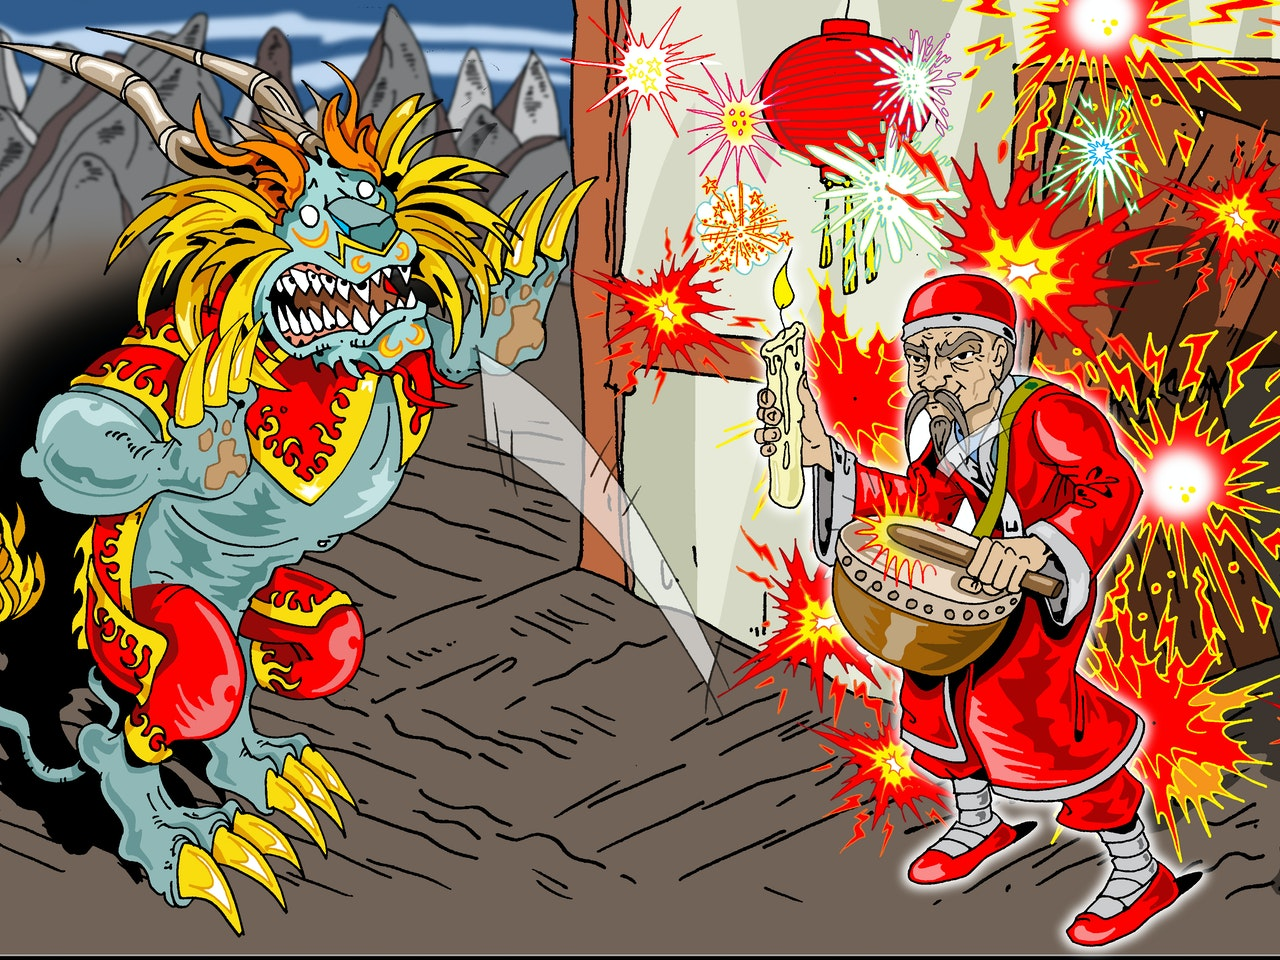 ancient myth legend horror monster spirit china chinese lion fireworks  manga anime childrens cartoon comic strip Book cover illustration animation